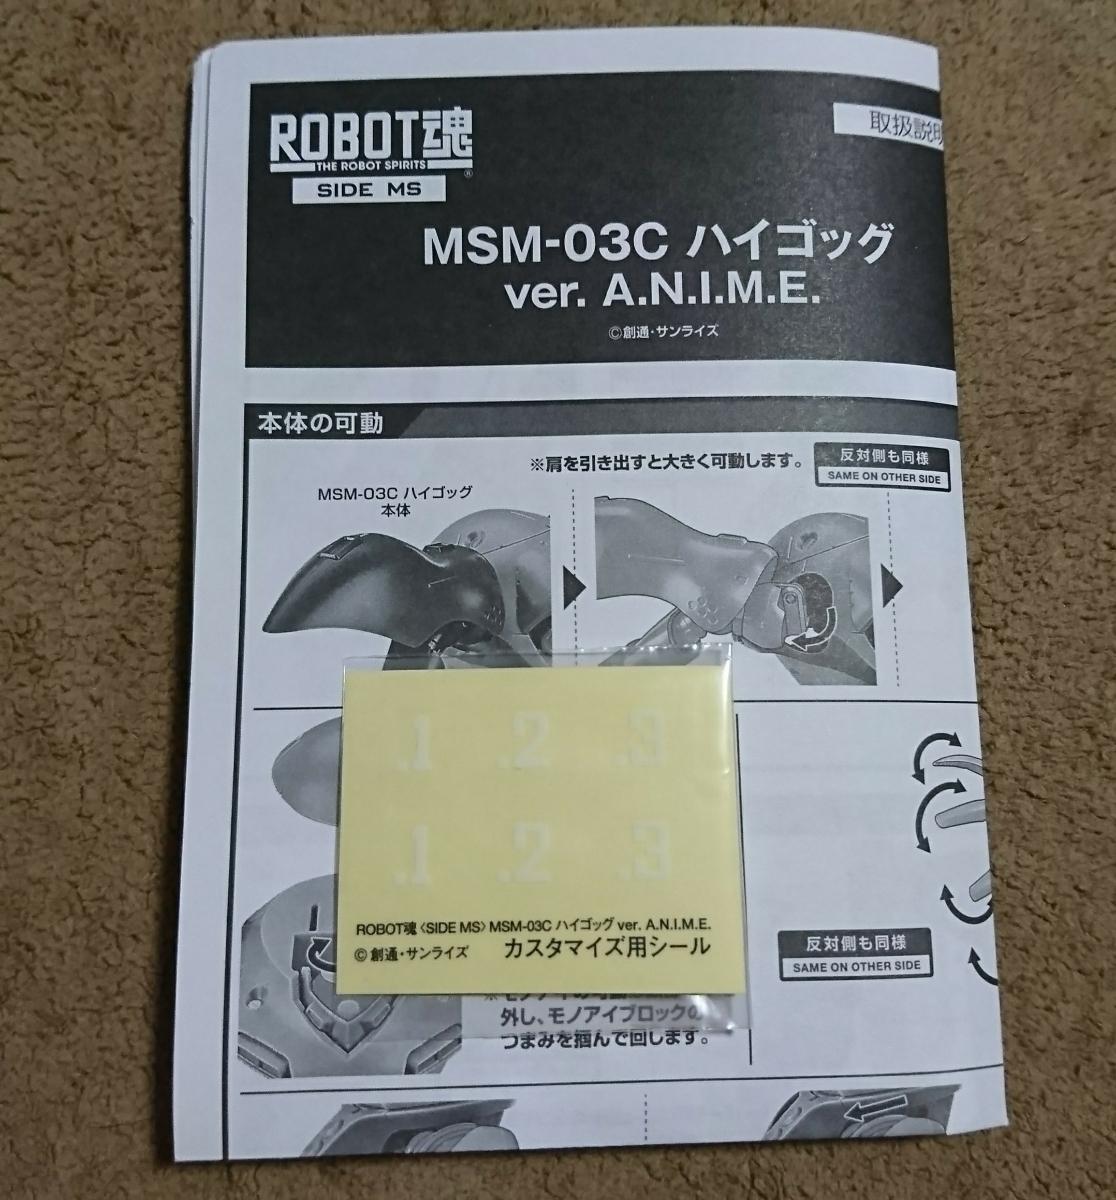 ROBOT魂 <SIDE MS> MSM-03C ハイゴッグ ver. A.N.I.M.E. 開封品 機動戦士ガンダム0080 ポケットの中の戦争_画像3